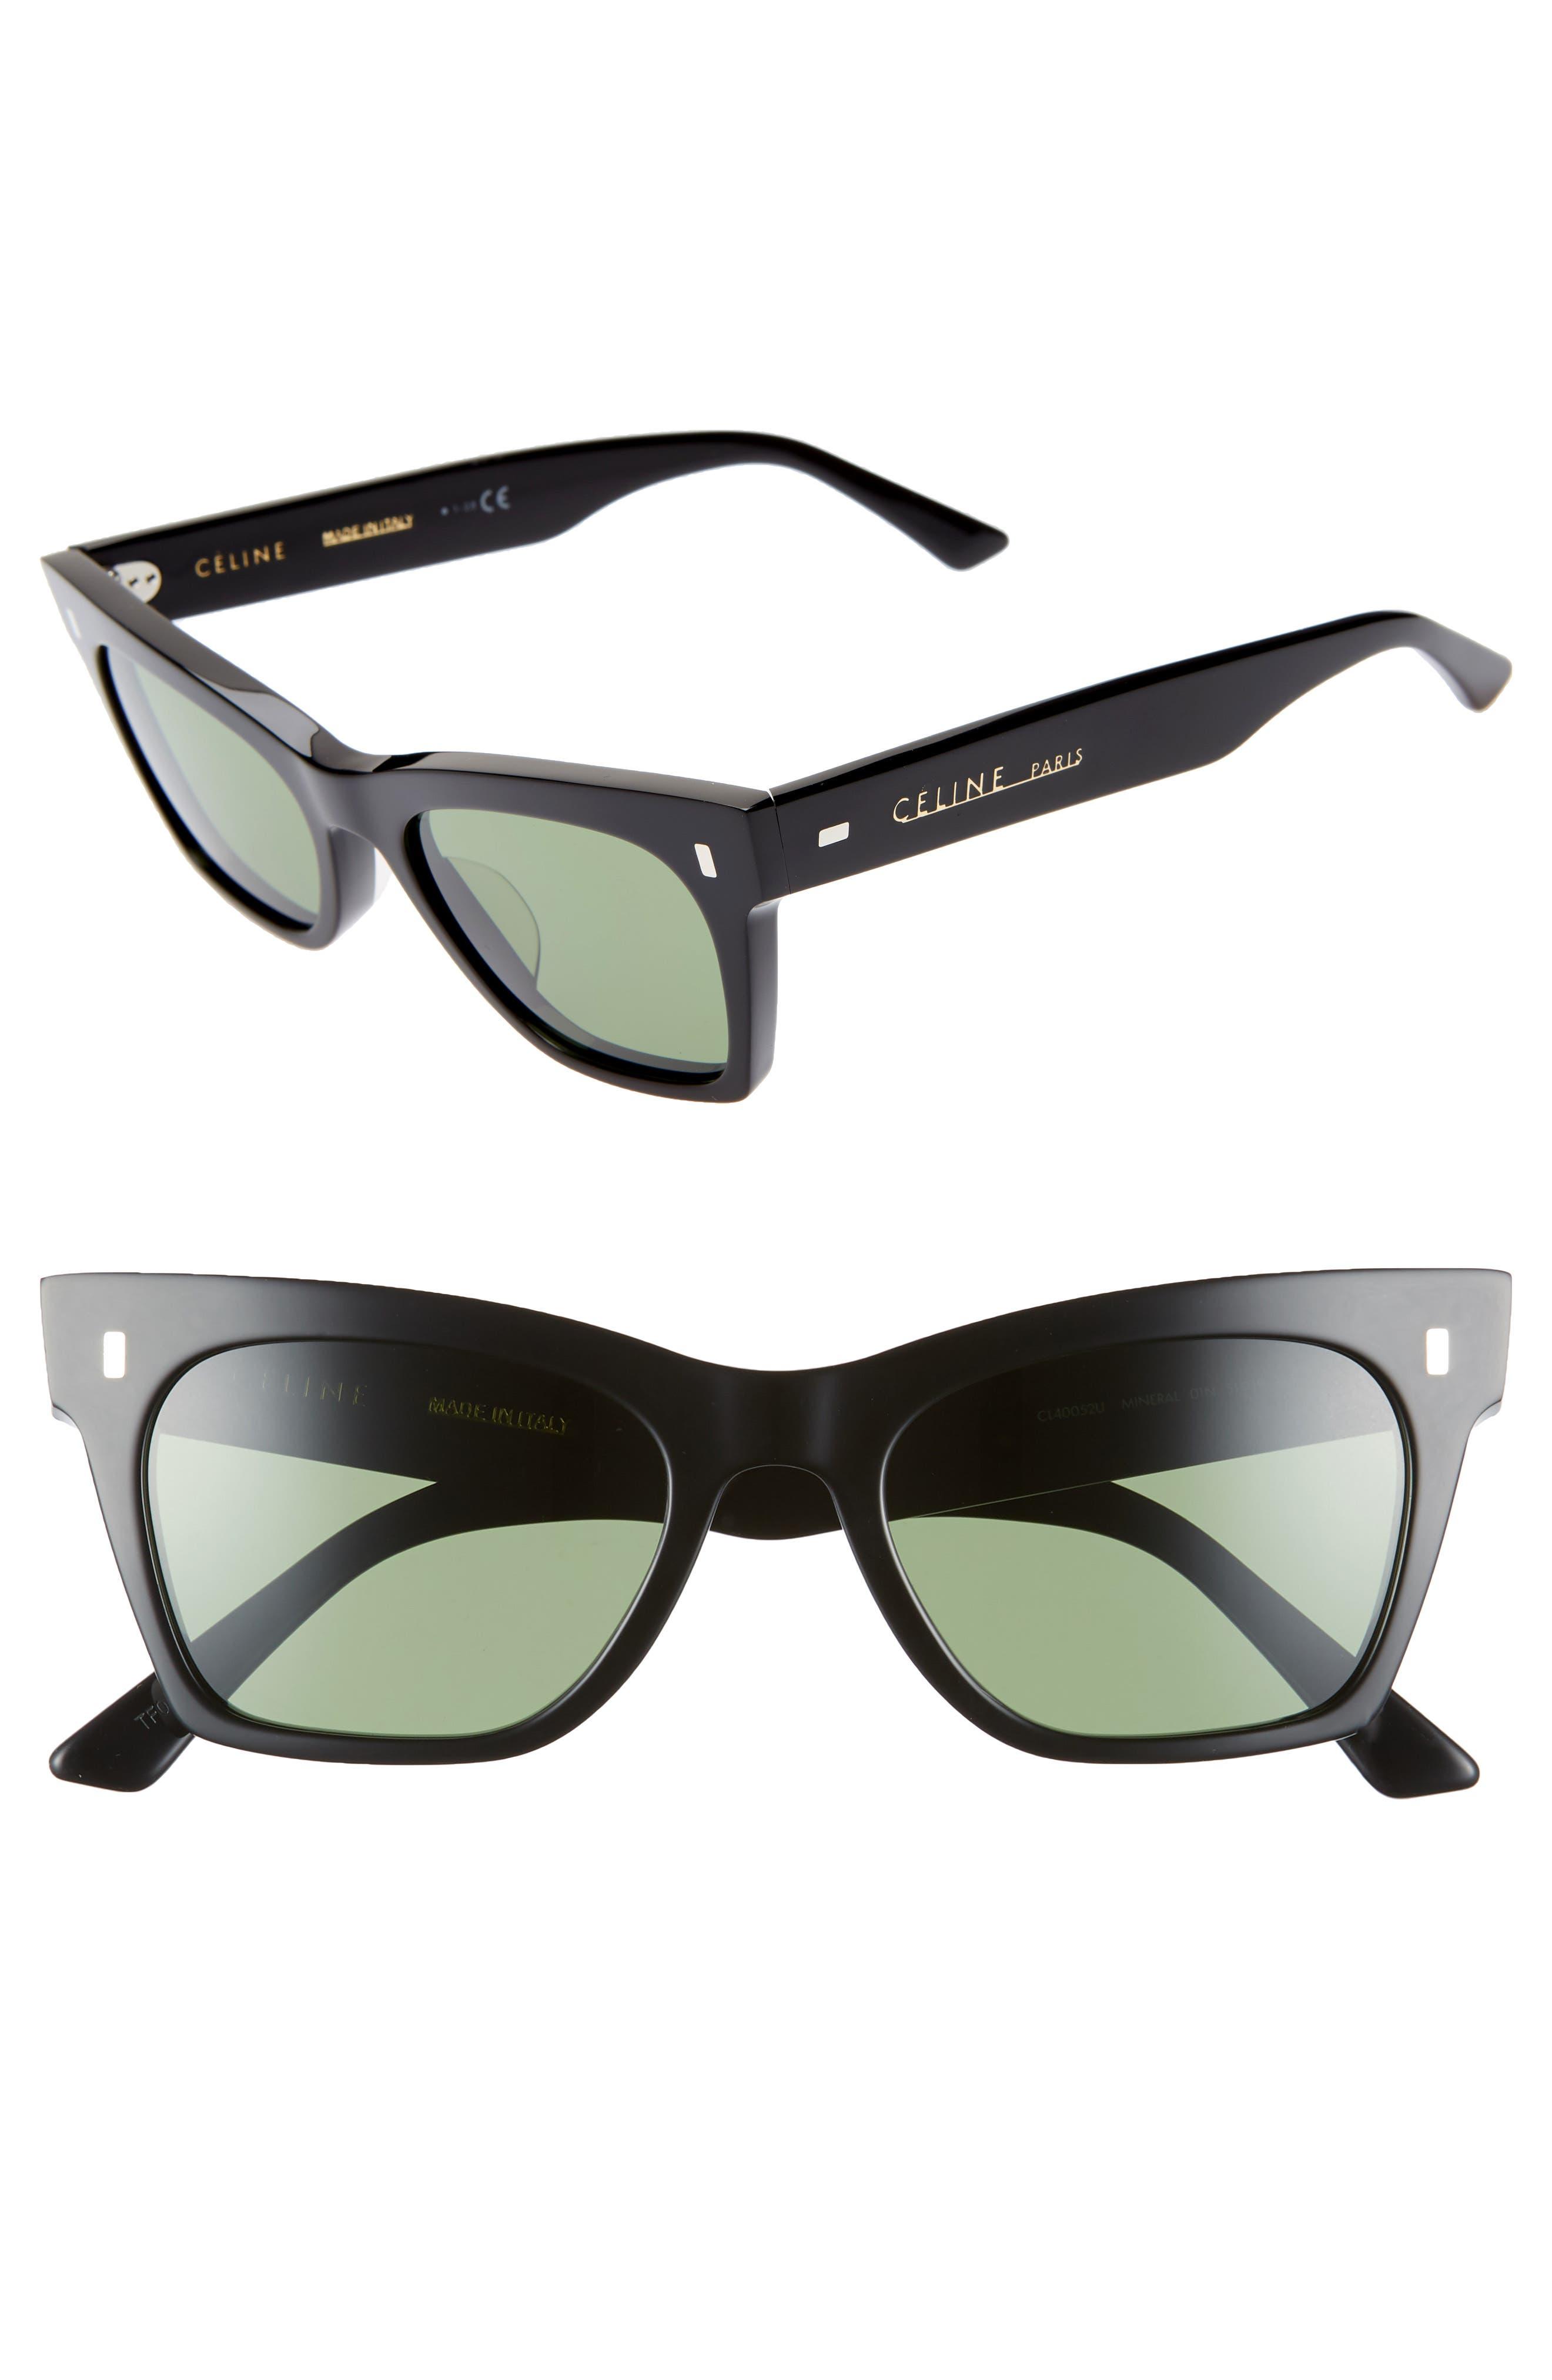 51Mm Smart Fit Sunglasses - Shiny Black/ Green